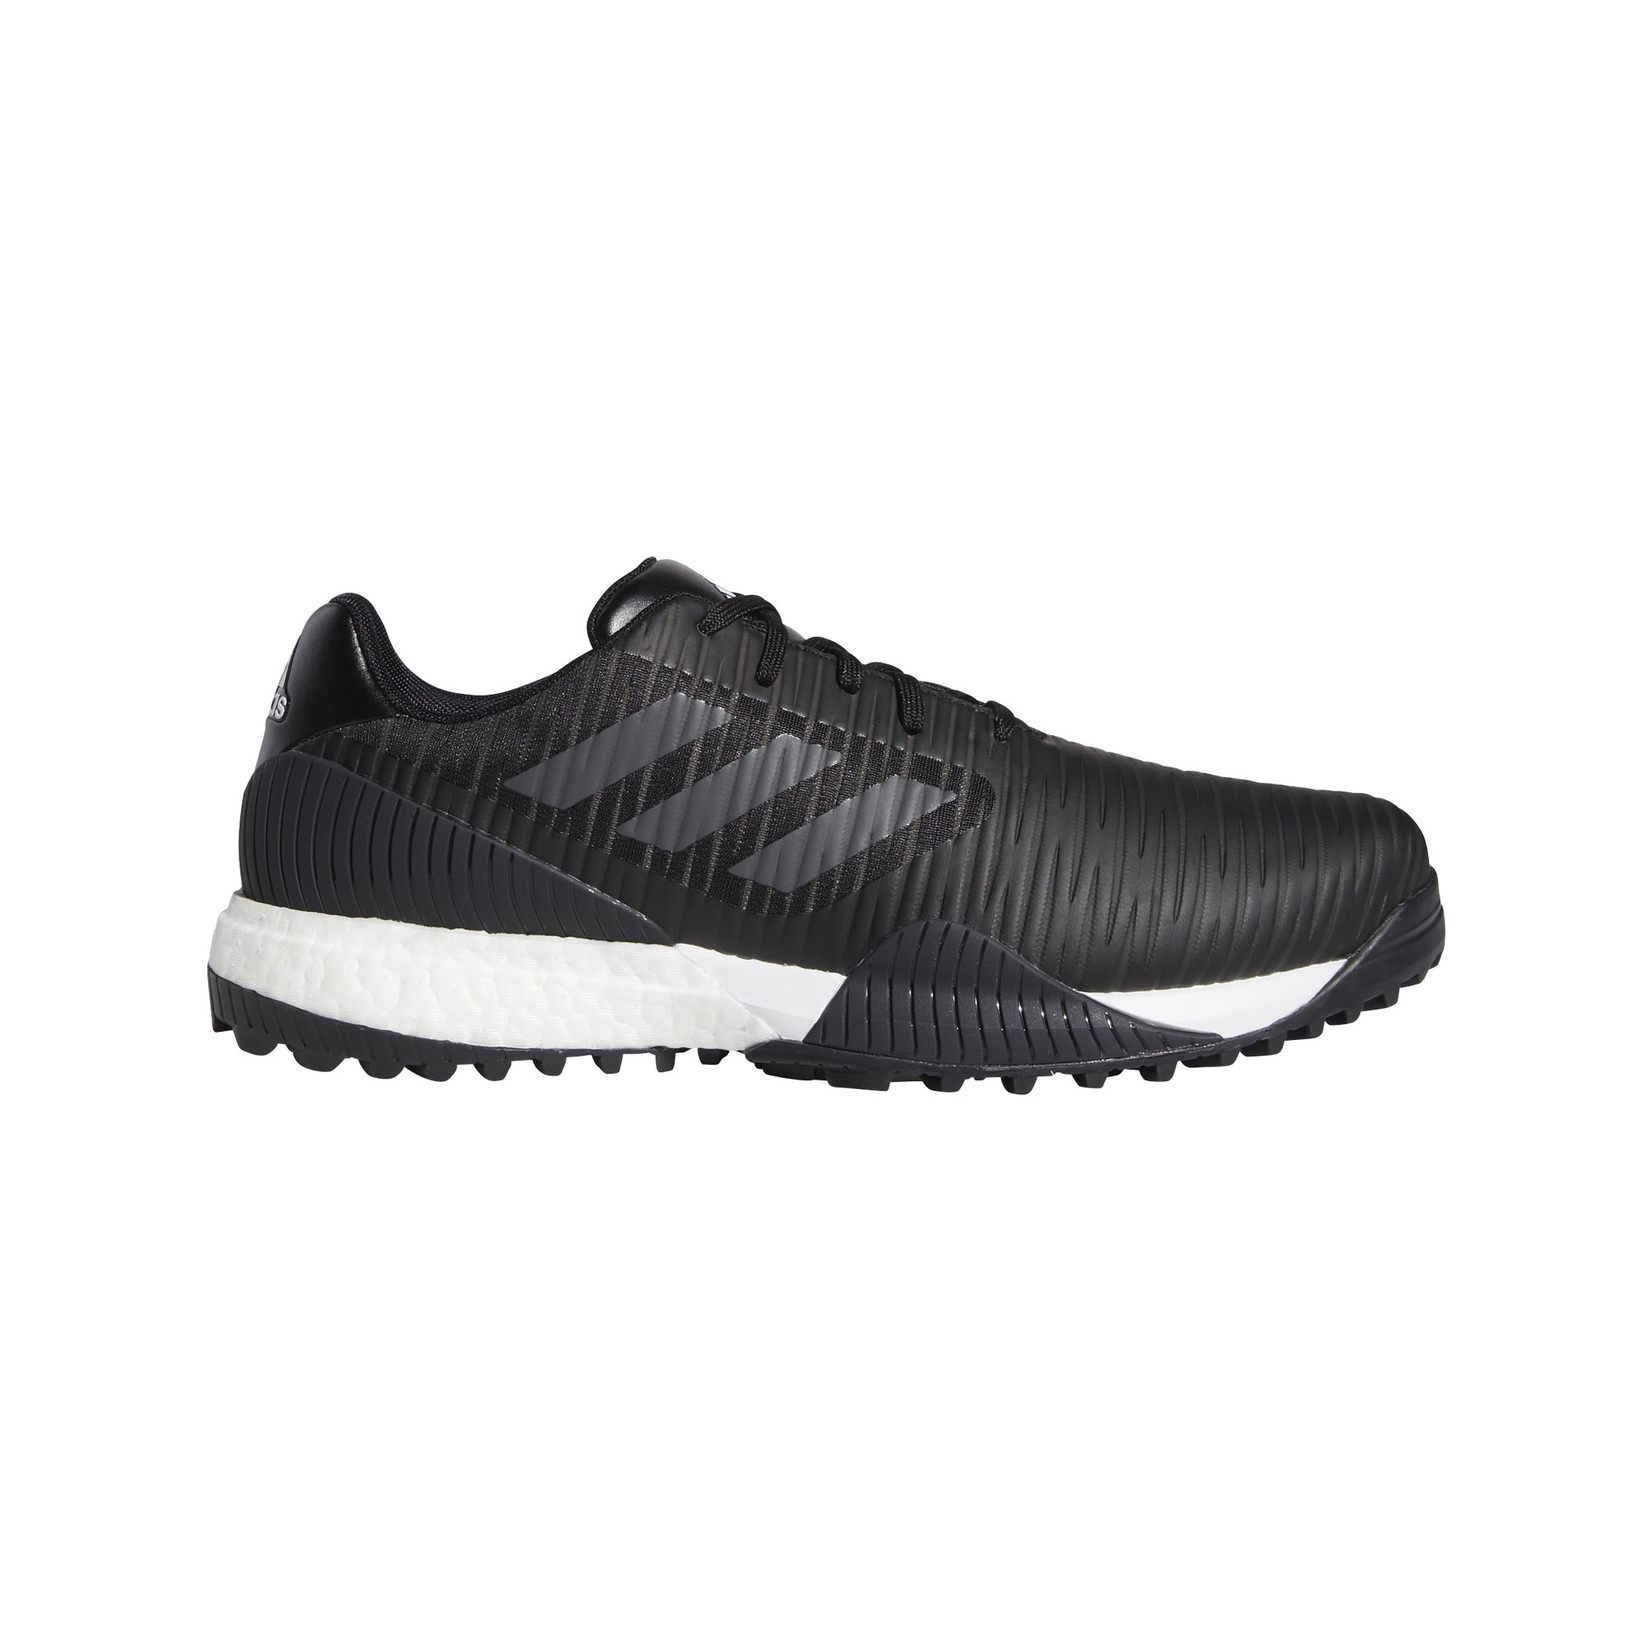 Adidas Adidas CodeChaos Sport WIDE Black UK 11